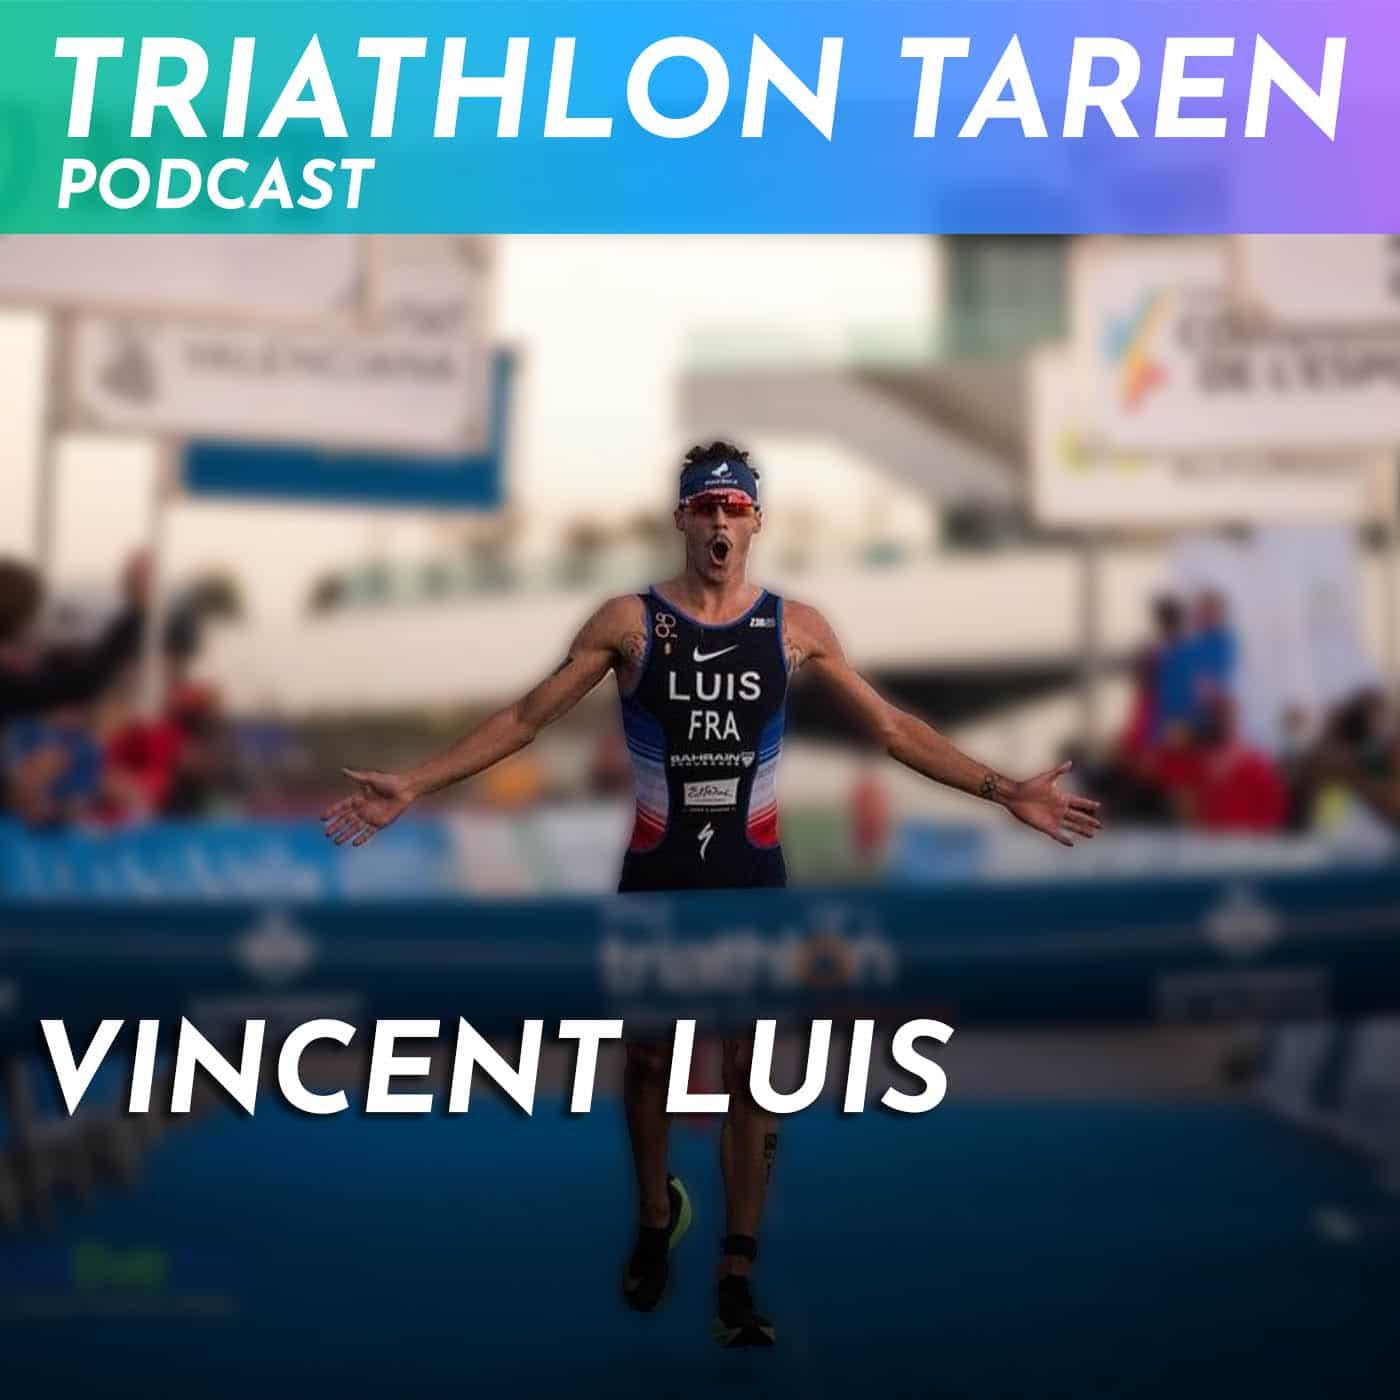 Short Course vs Ironman Athletes With #1 ITU Triathlete